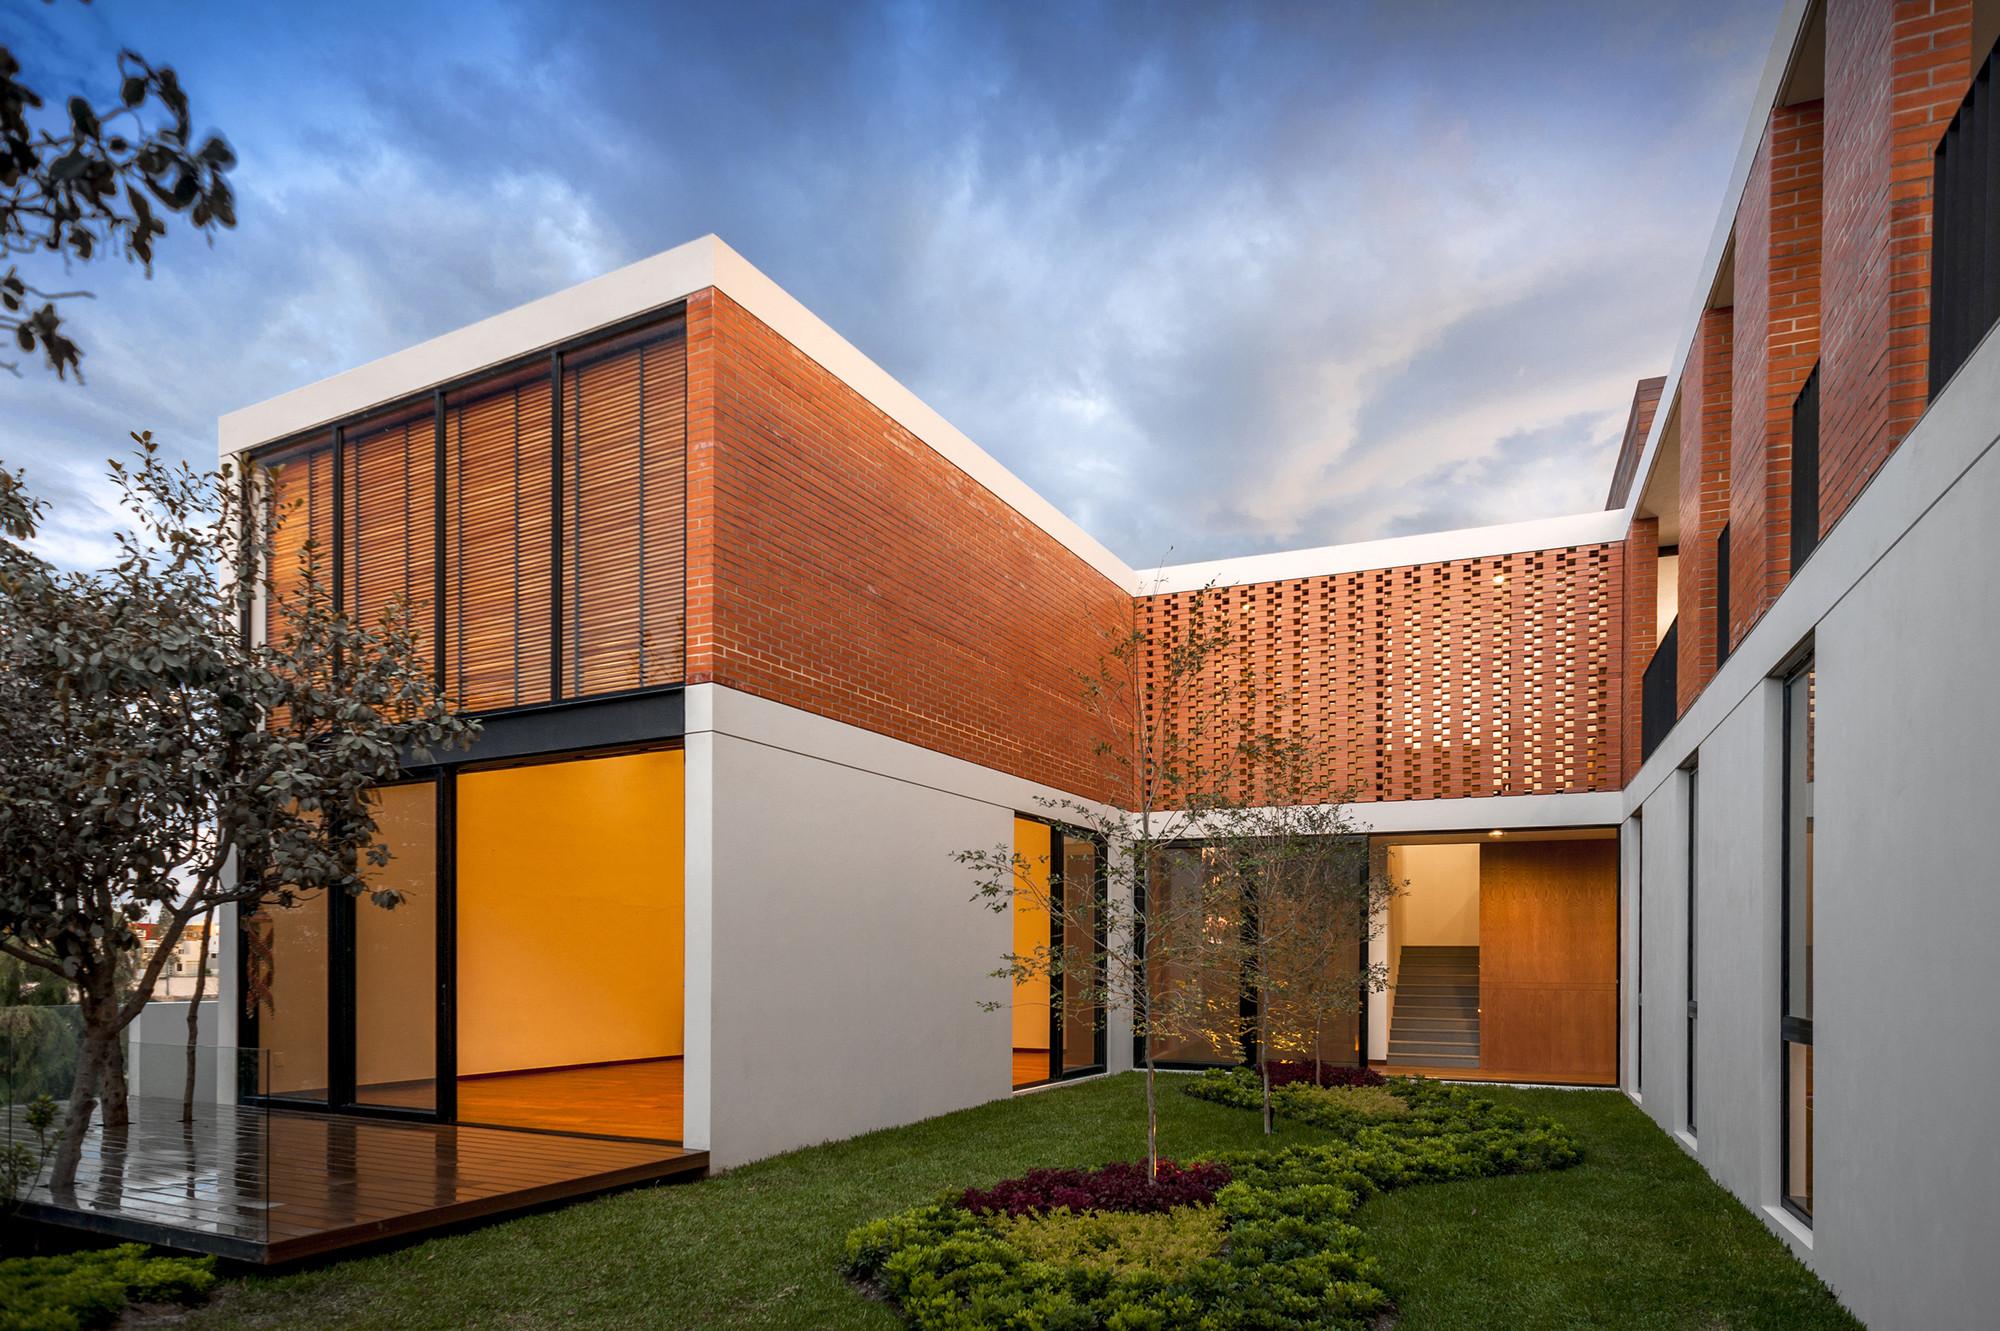 Galeria de casa ro alexanderson arquitectos 7 for Casa de arquitectos